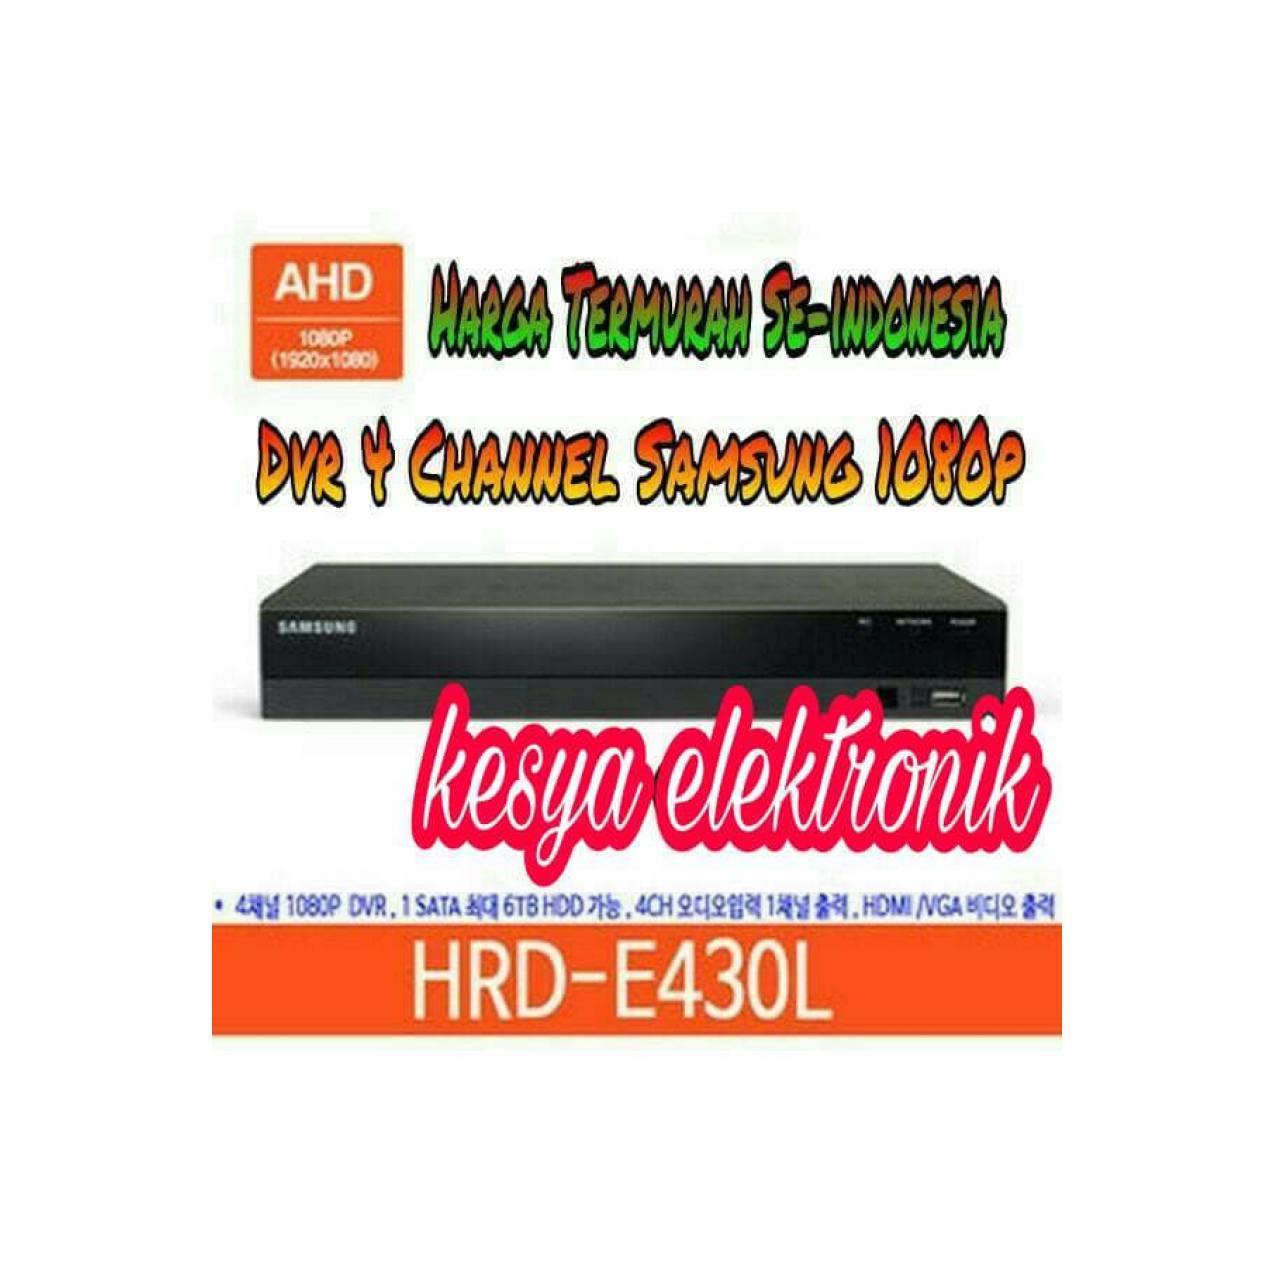 TERBARU DVR SAMSUNG 4 CH FULL HD HDR-E430L 1080P